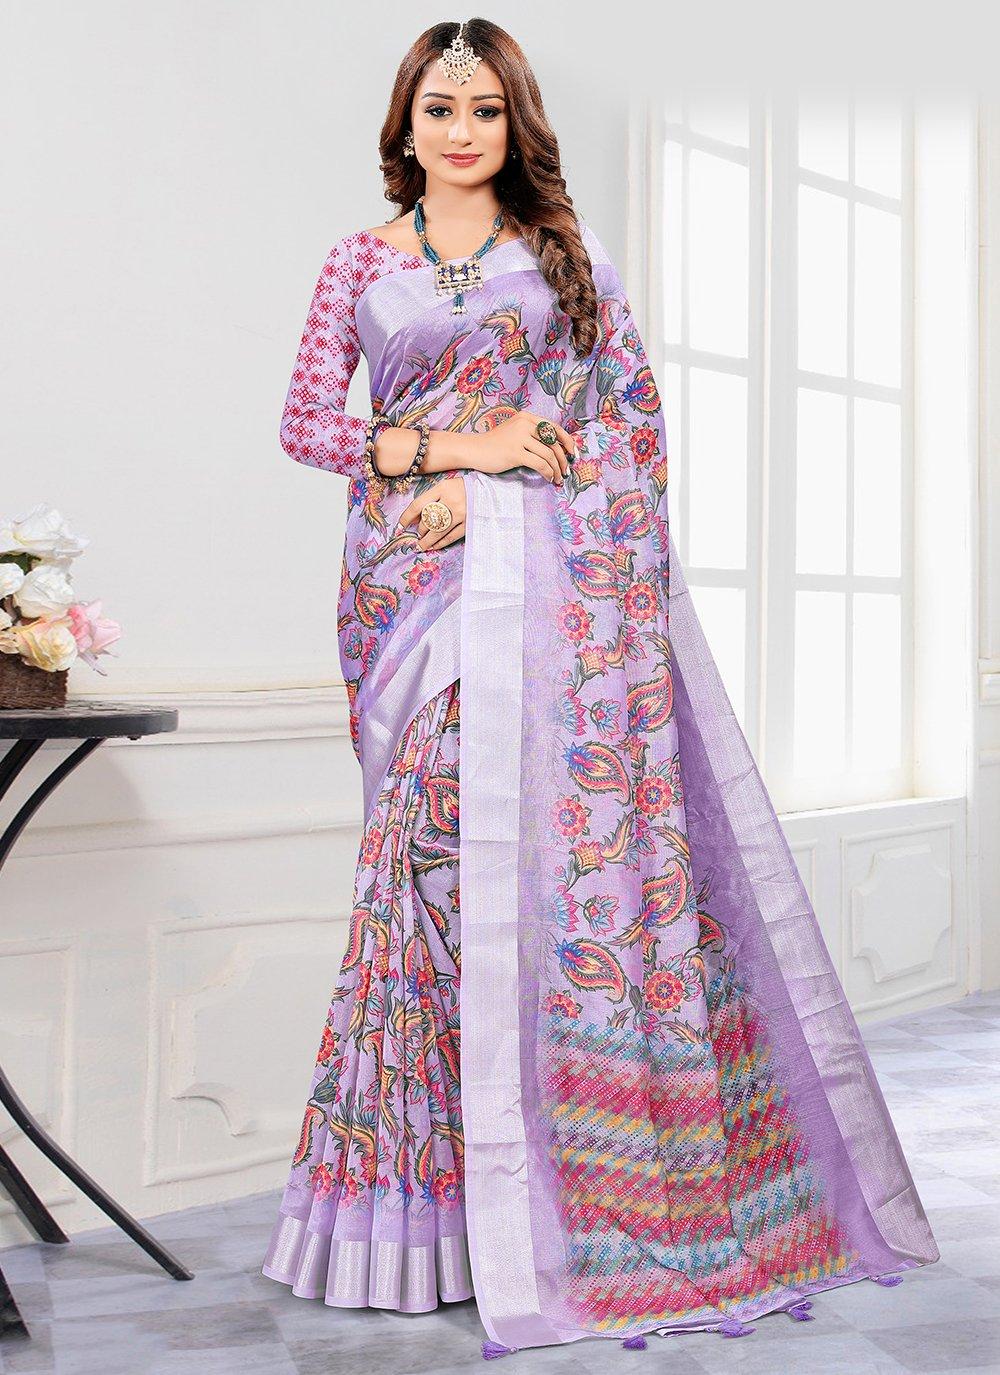 Cotton Digital Print Printed Saree in Lavender